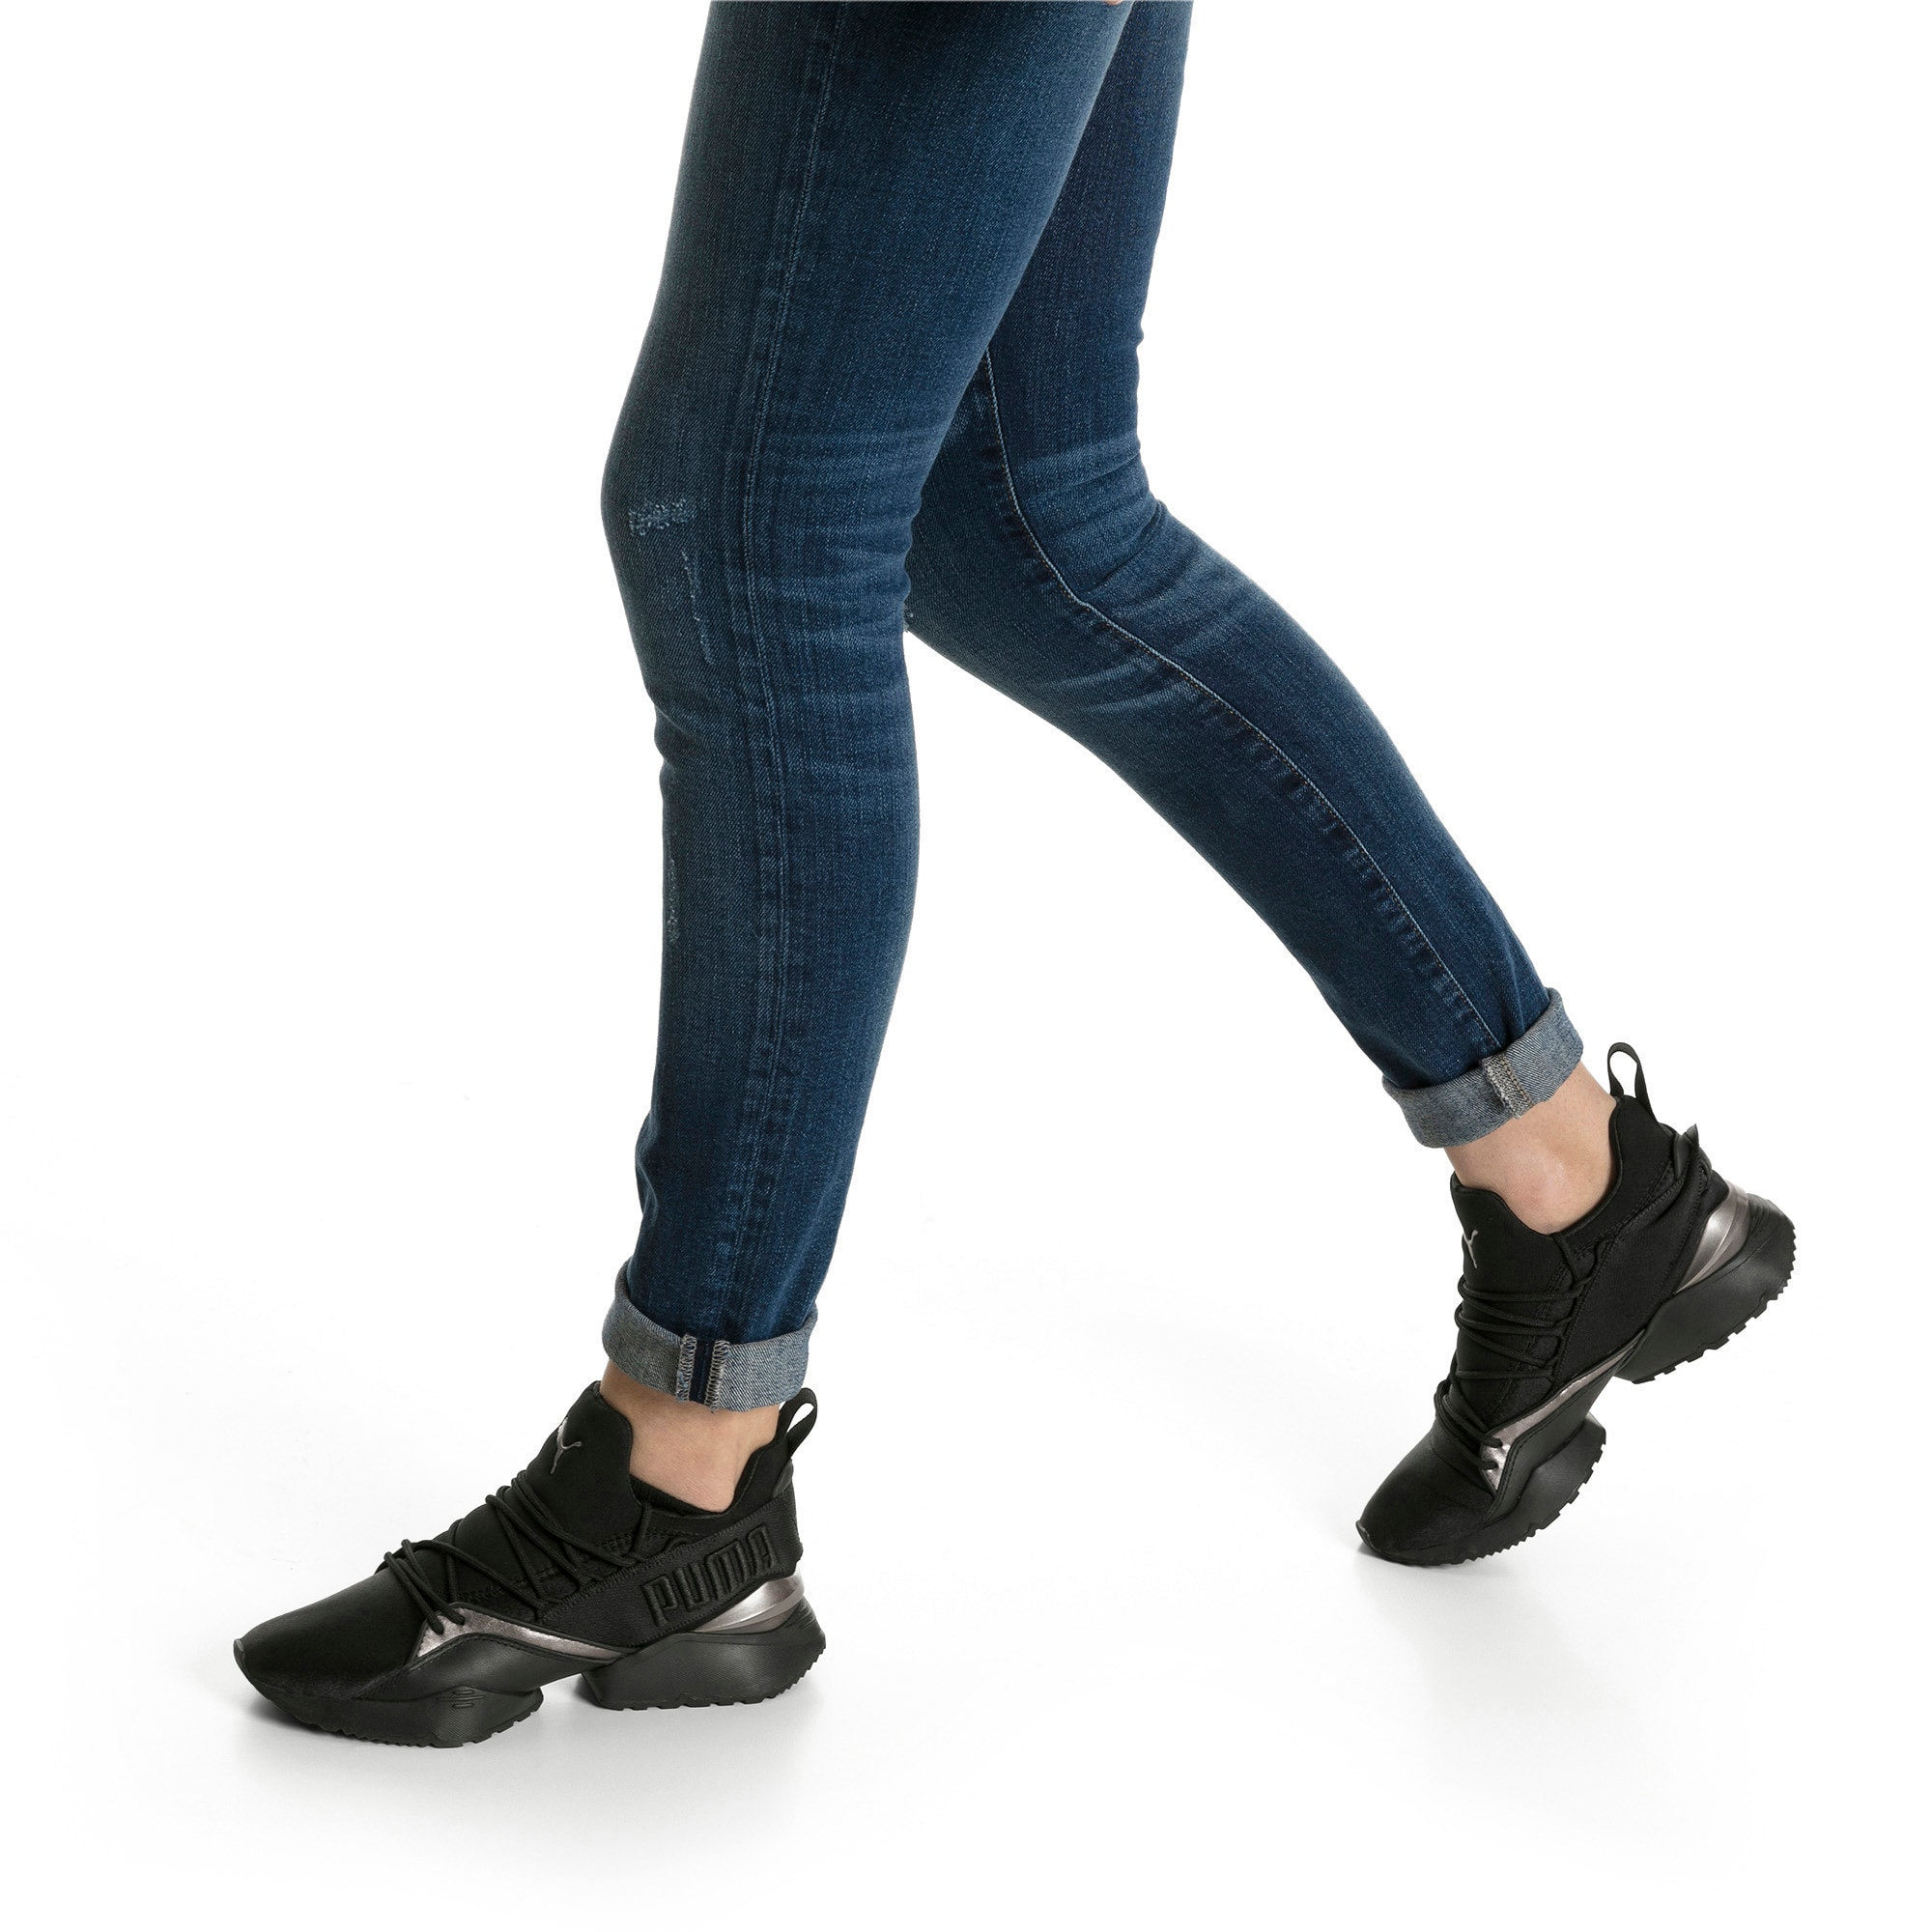 Thumbnail 7 of Muse Maia Luxe Women's Sneakers, Puma Black-Puma Black, medium